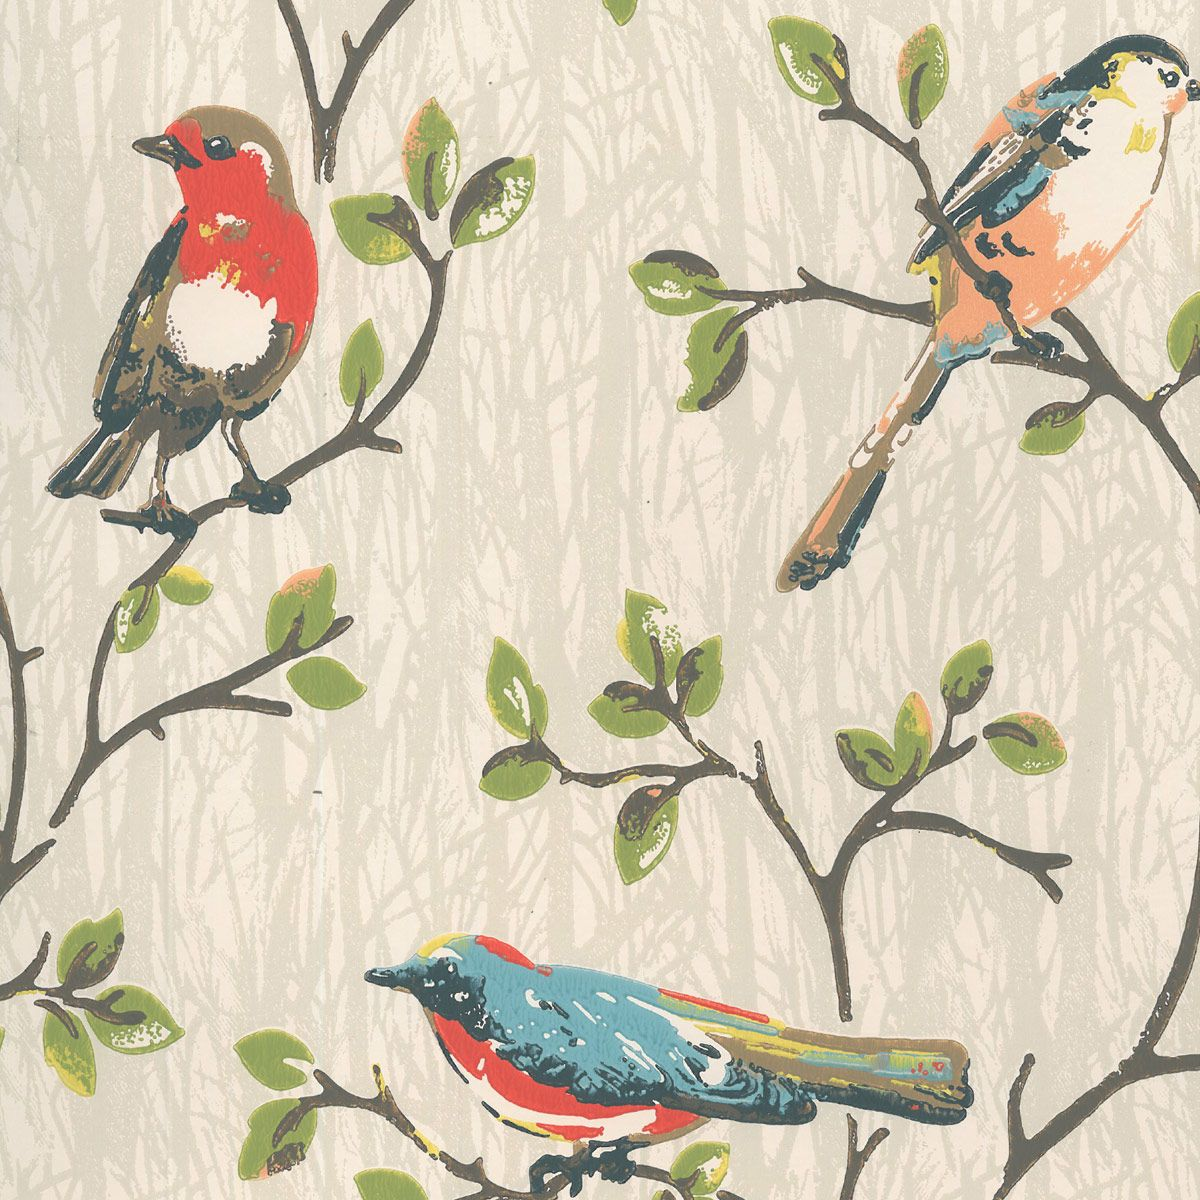 Wallpaper Garden Birds Wallpaper Cathkidston Bird Wallpaper Retro Wallpaper Mural Wallpaper